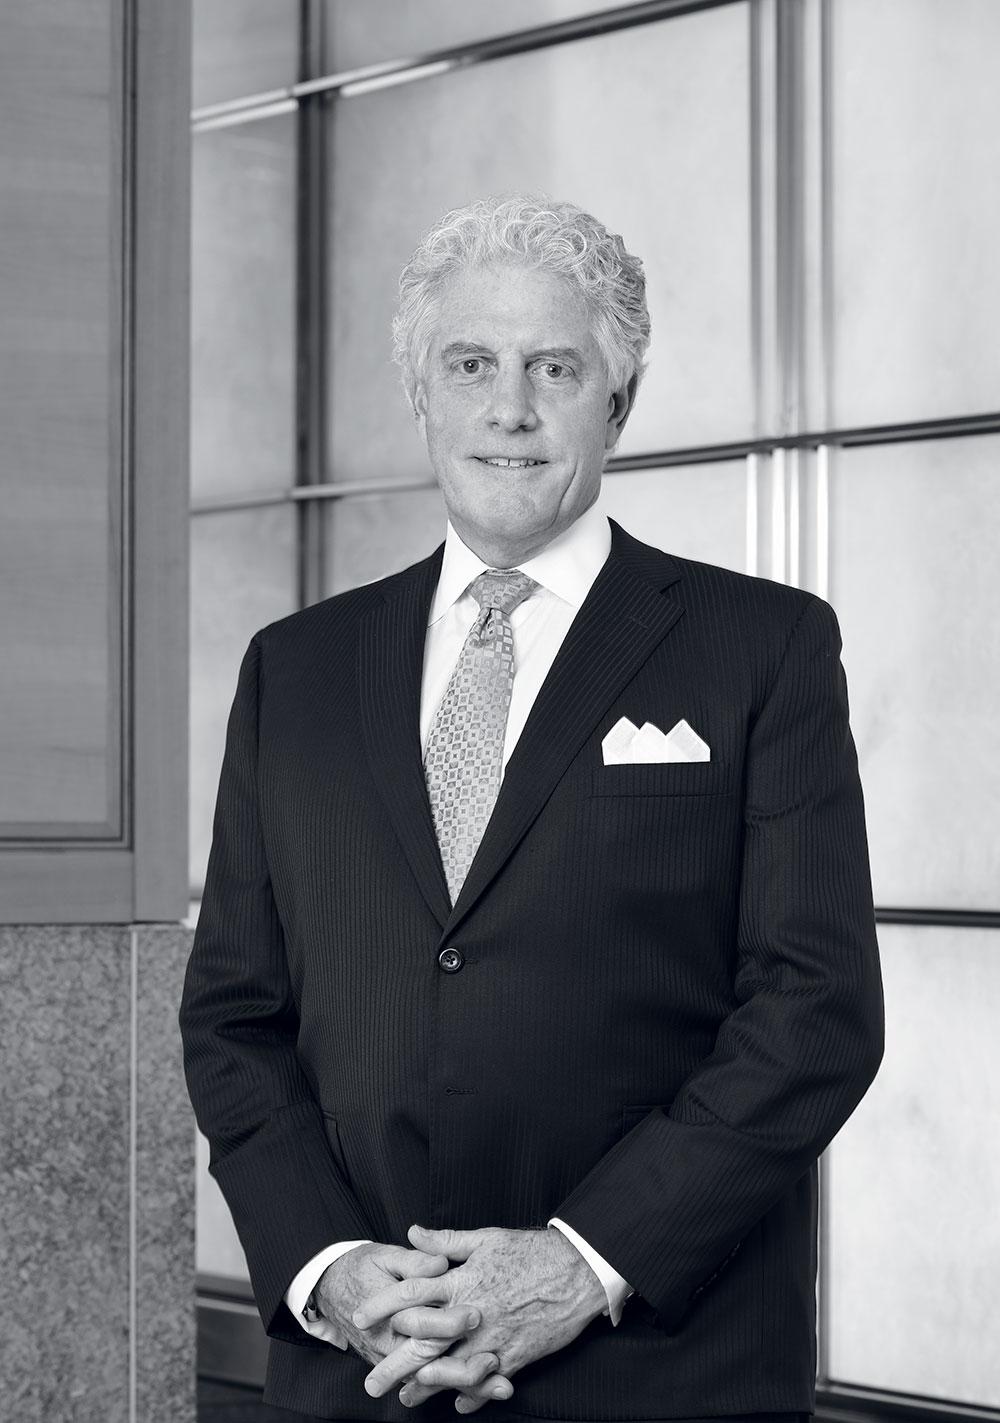 Patrick M. Regan